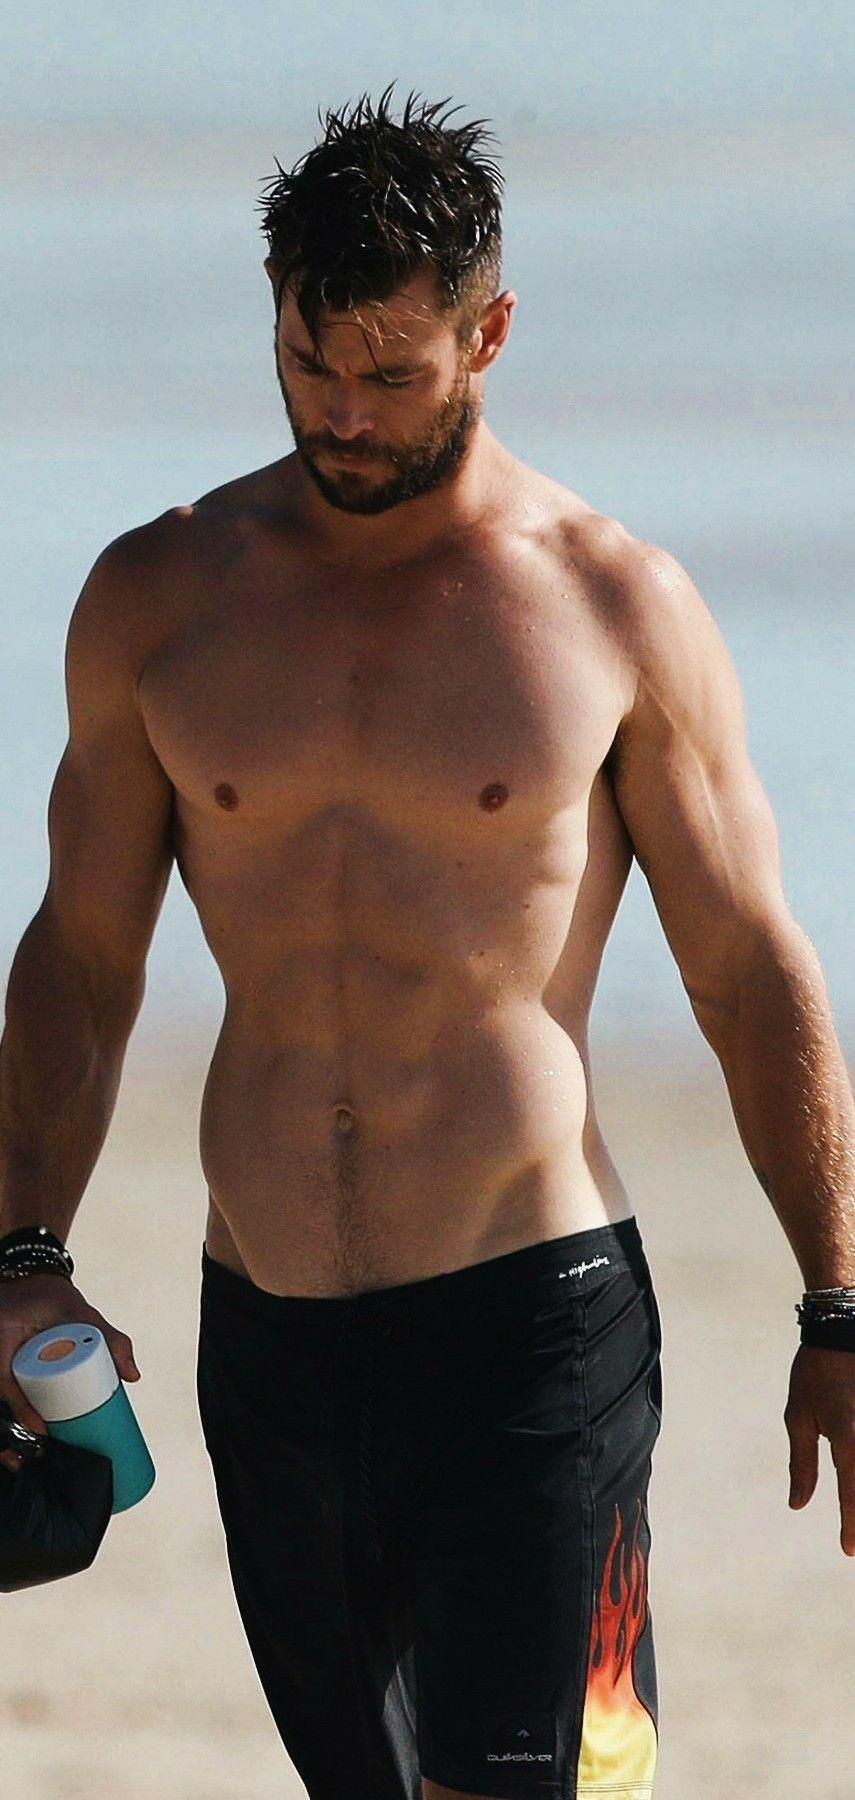 Chris Hemsworth Chris Hemsworth Shirtless Liam Hemsworth Chris Hemsworth